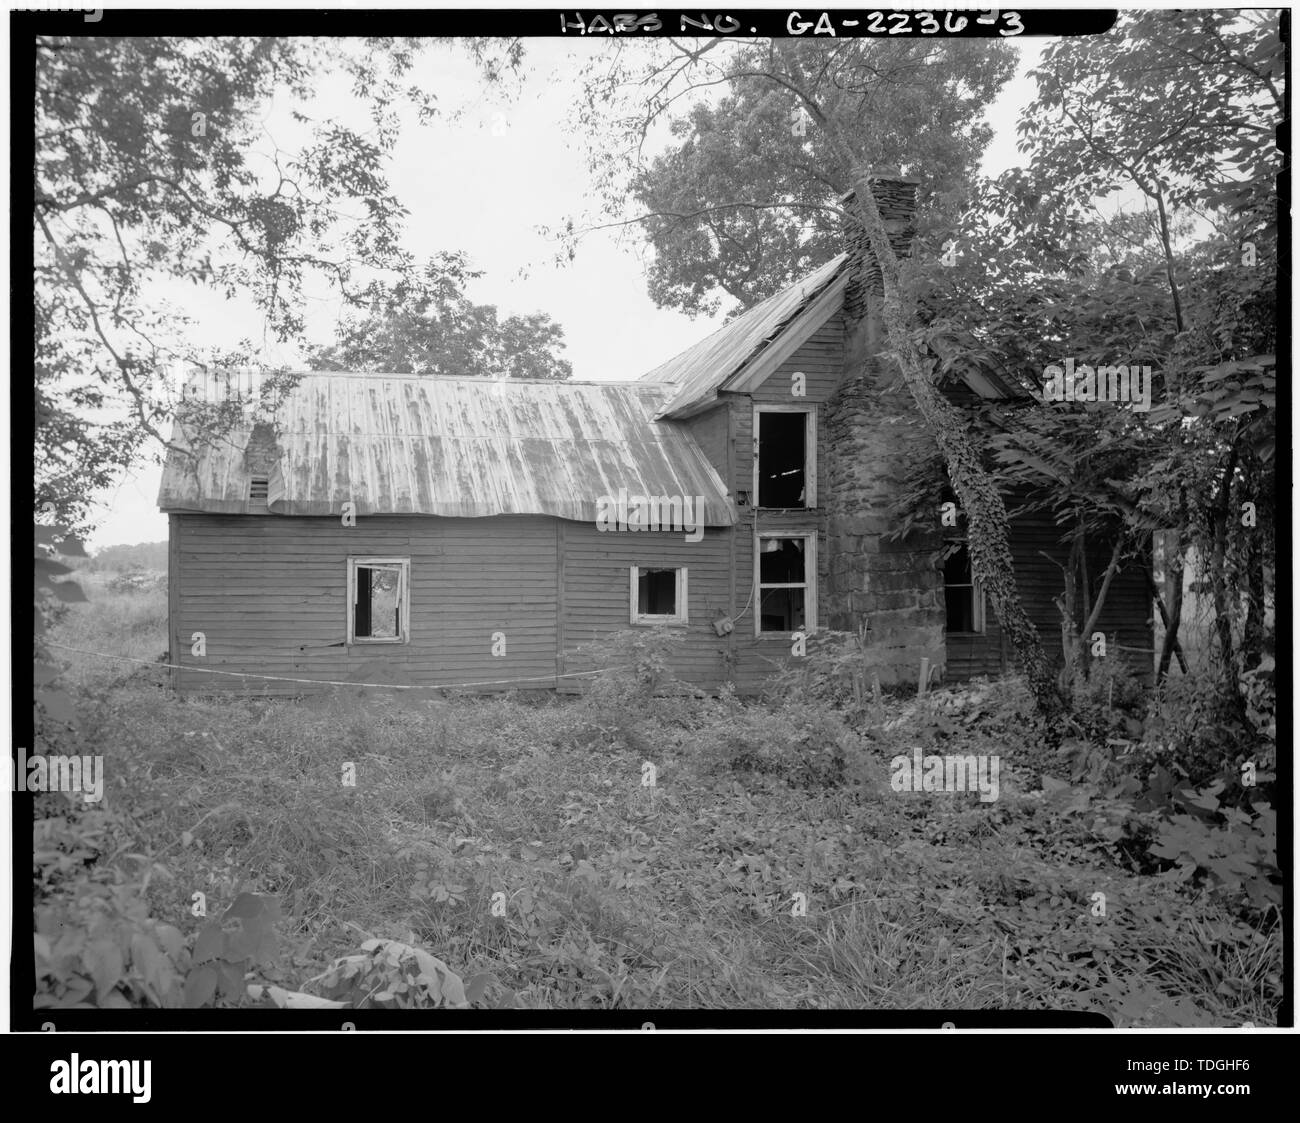 Gwinnett County Stock Photos & Gwinnett County Stock Images